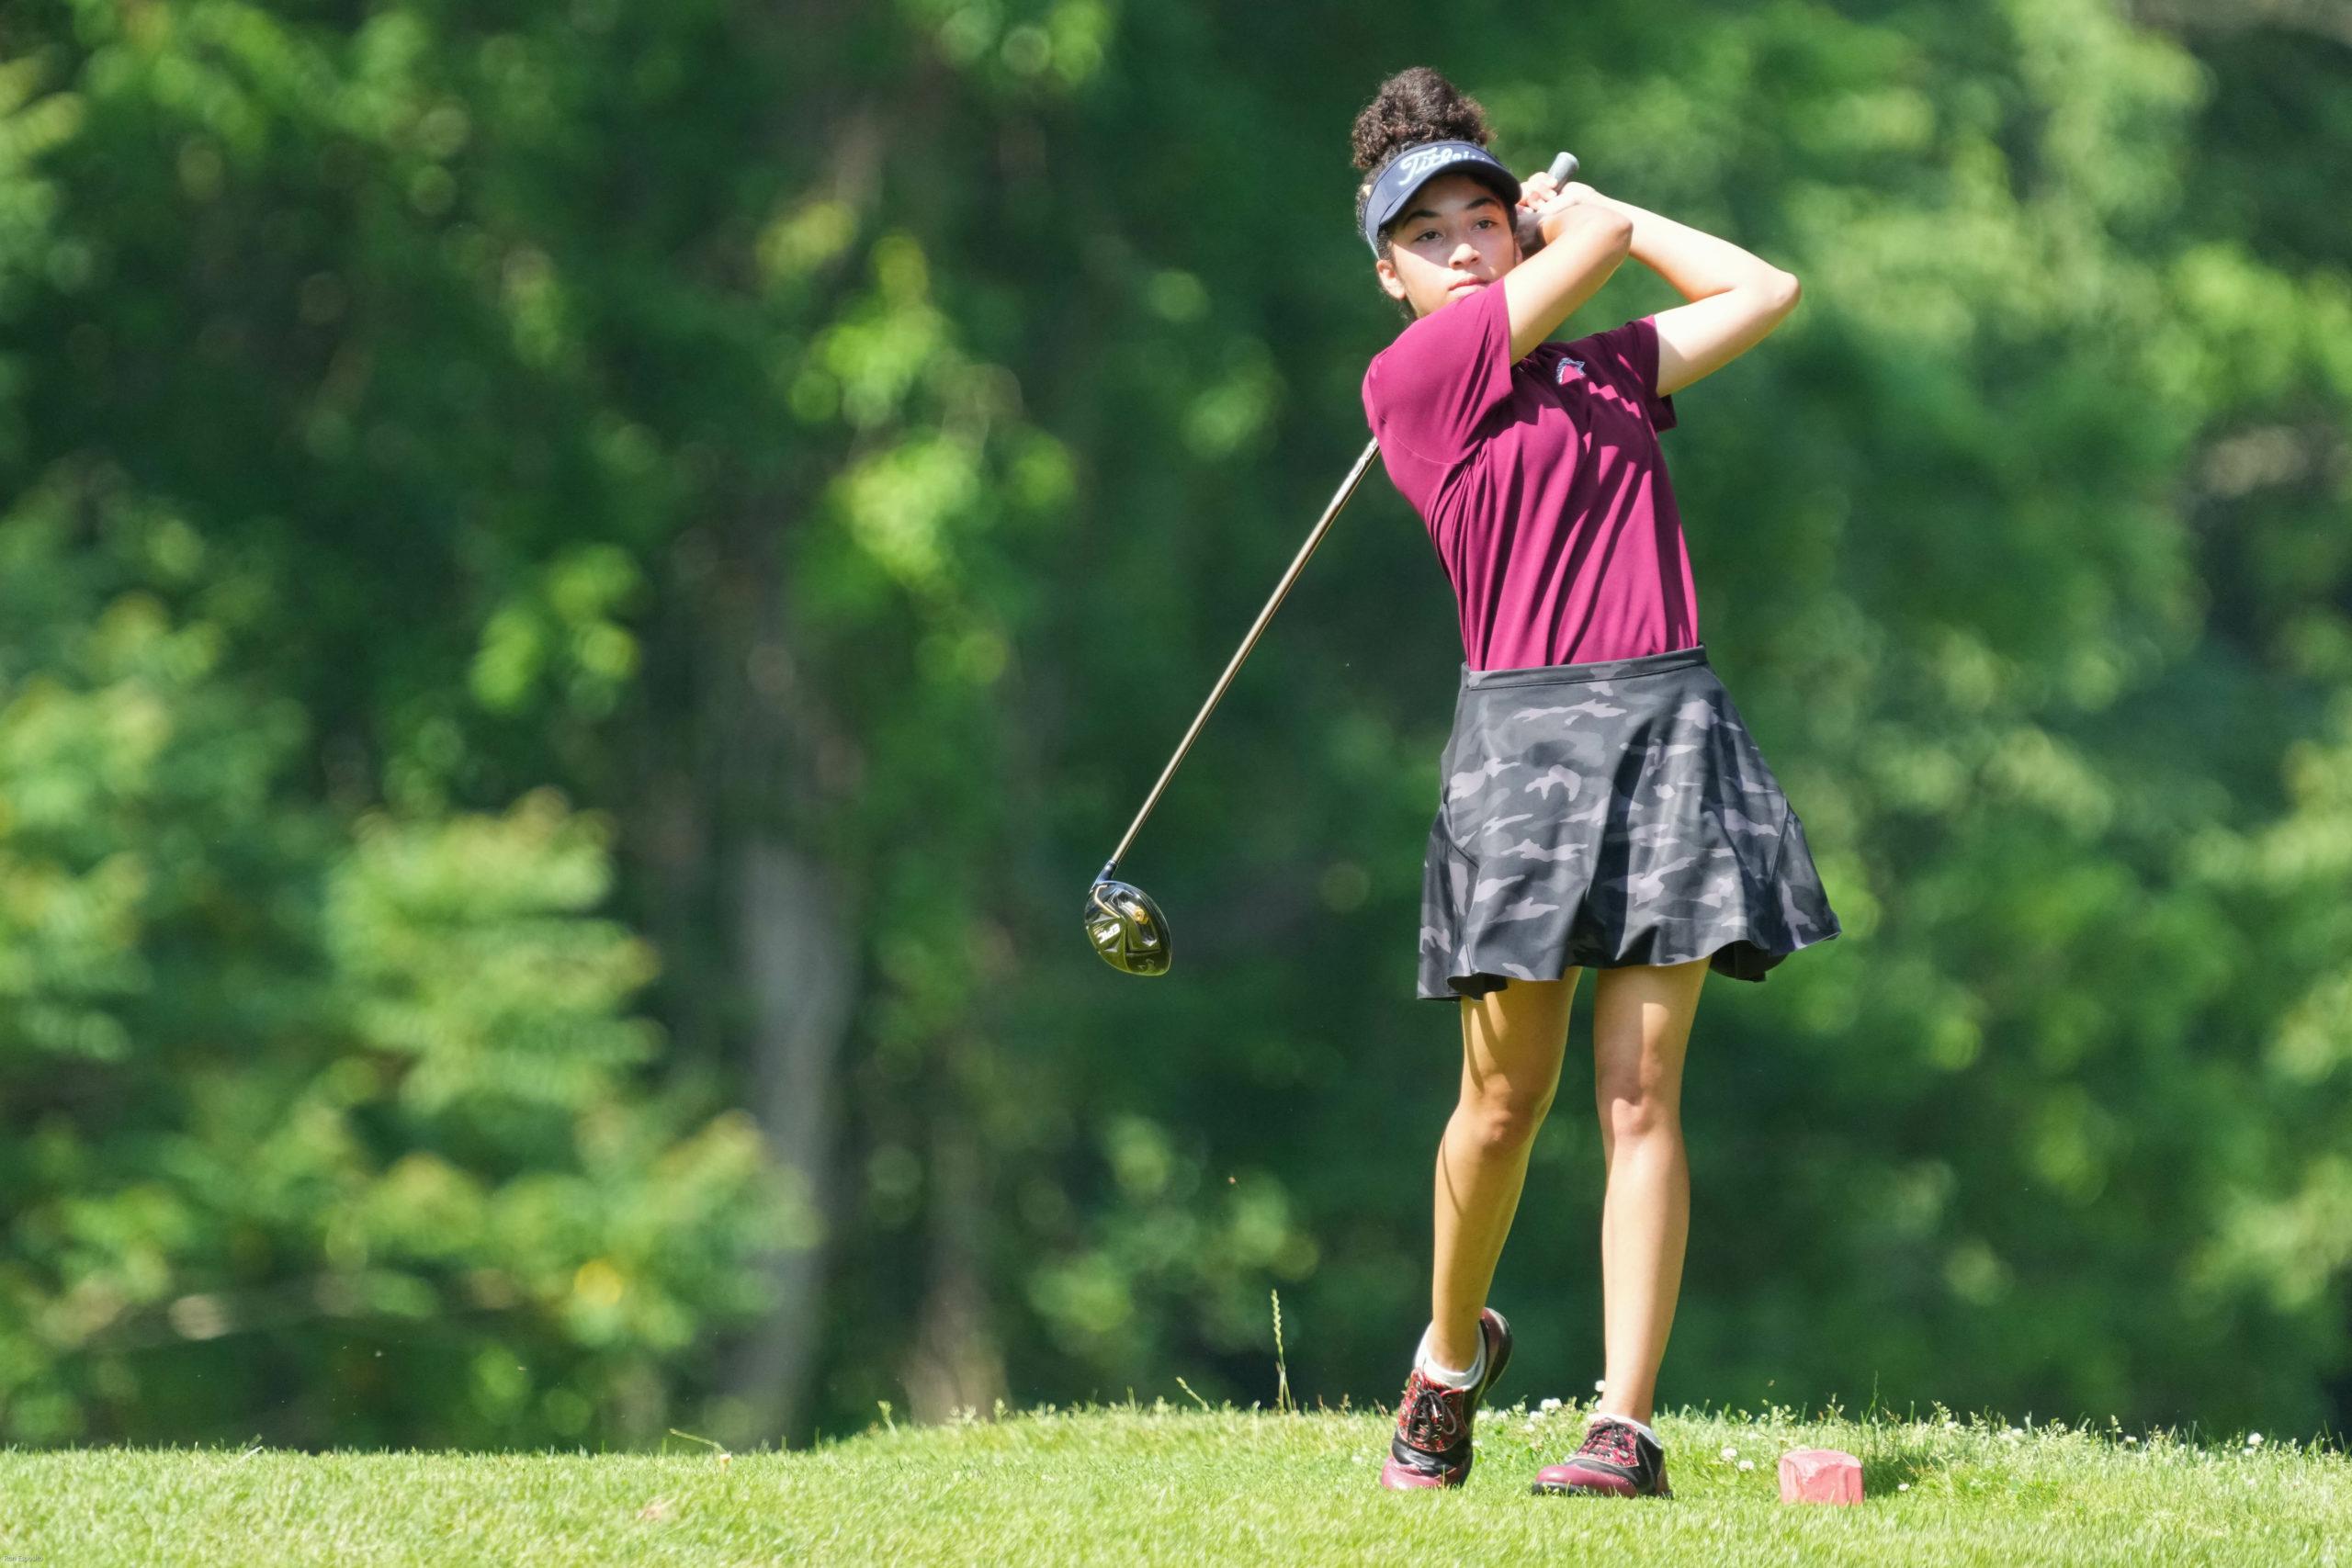 Southampton's Ella Coady won the Suffolk County girls golf individual title on Wednesday, June 9.